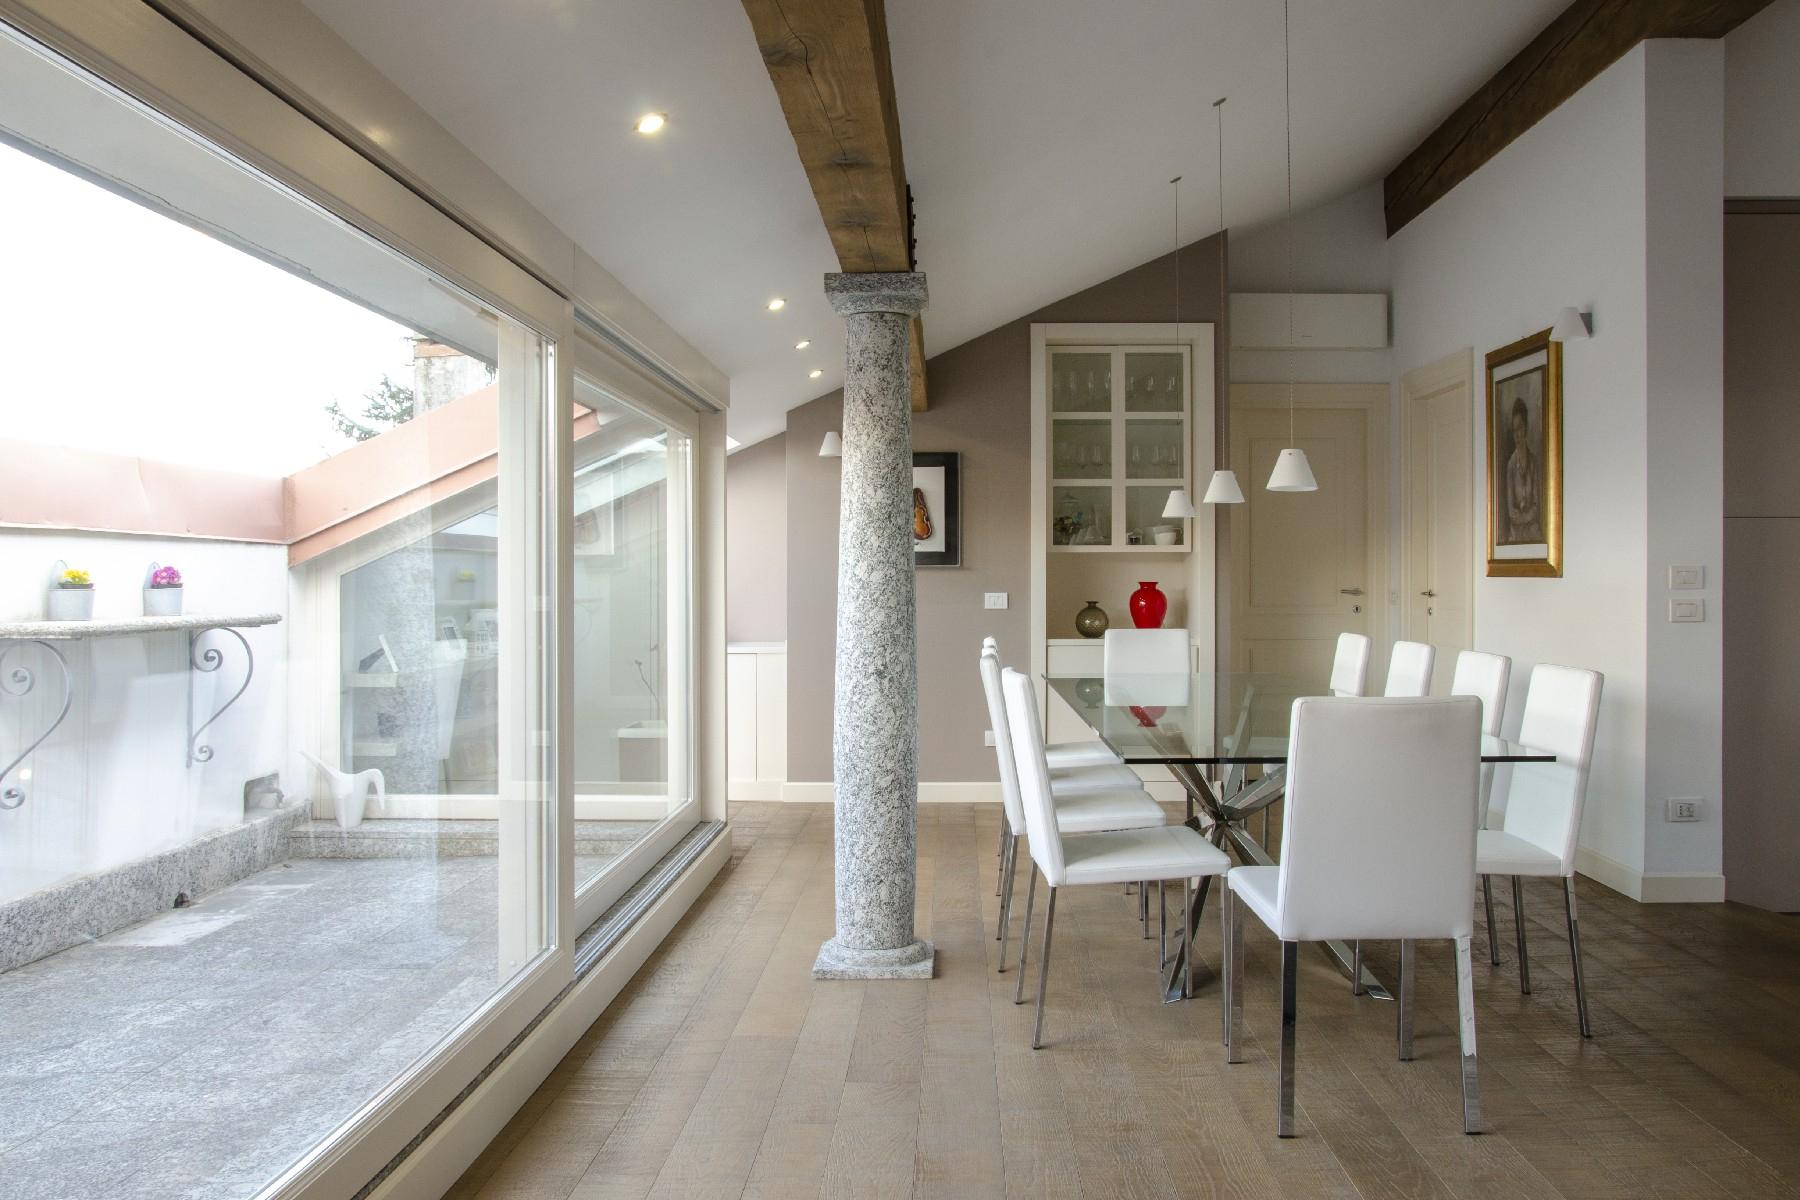 Appartamento in Vendita a Merate: 4 locali, 225 mq - Foto 15